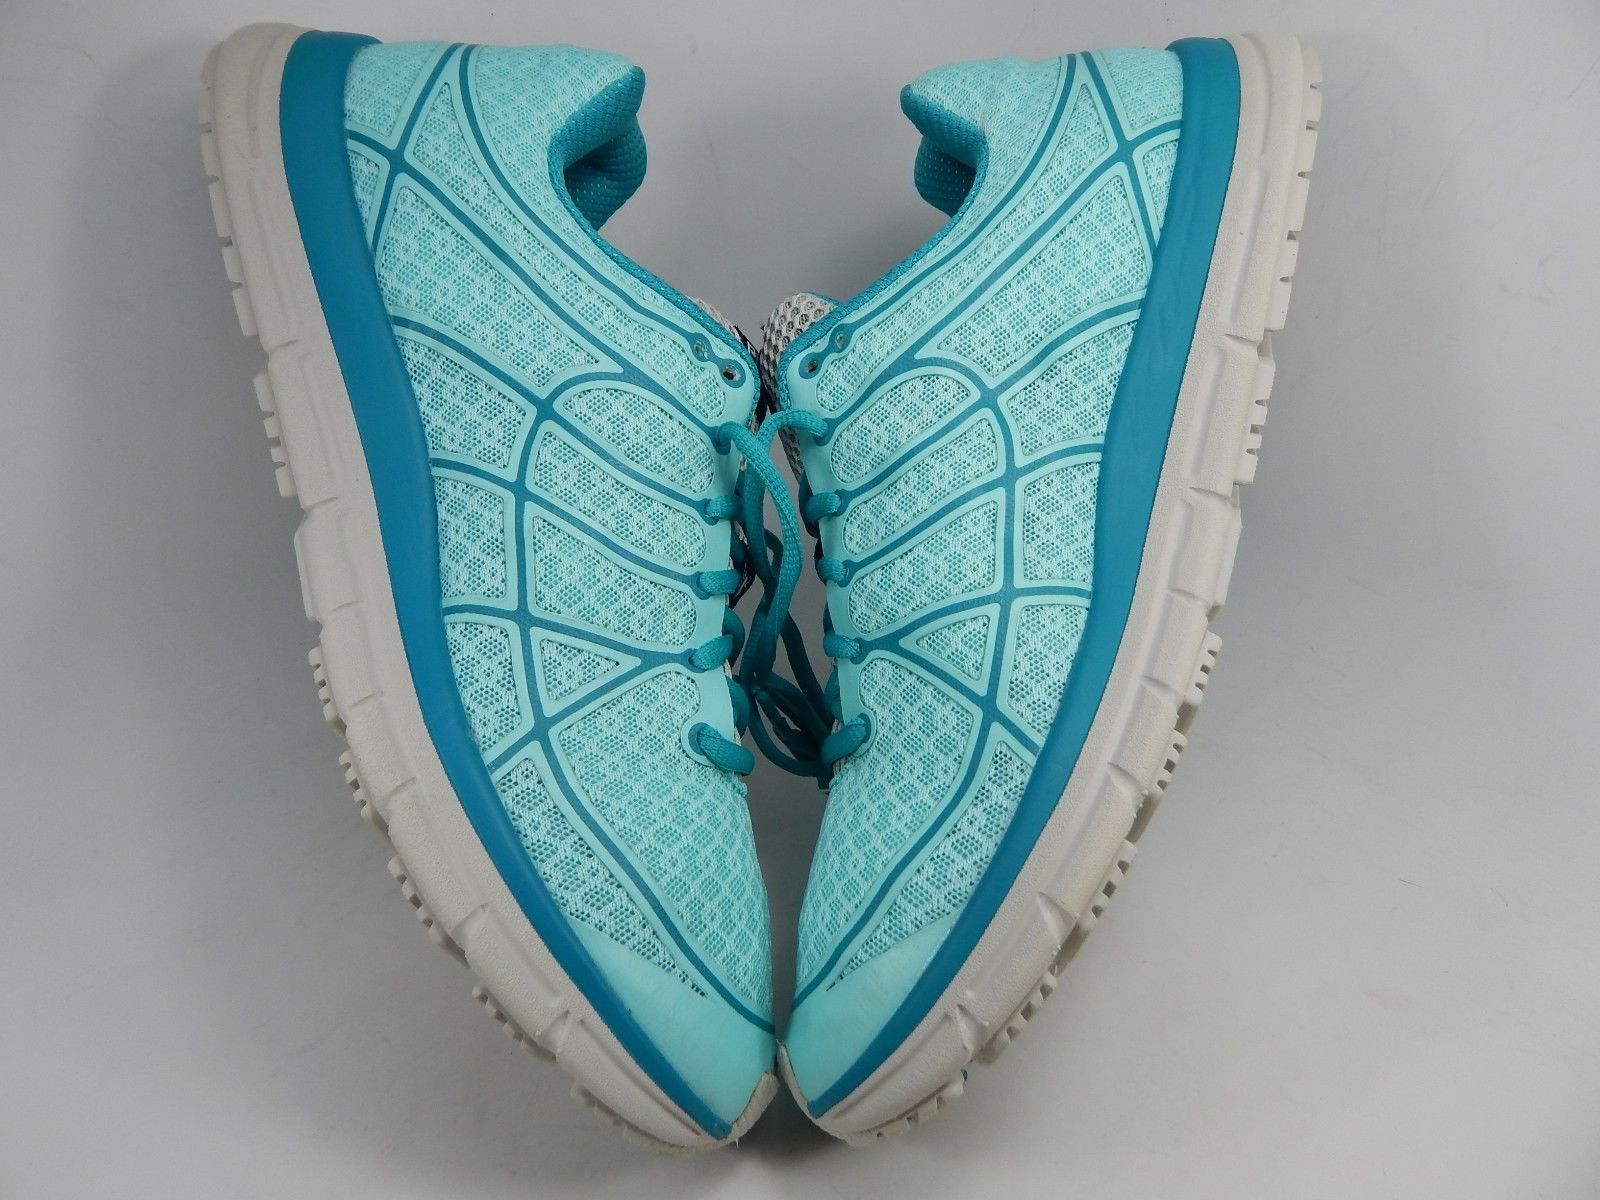 Pearl Izumi EM Road N 2 Women's Running Shoes Size 10.5 M (B) EU 42.5 Green